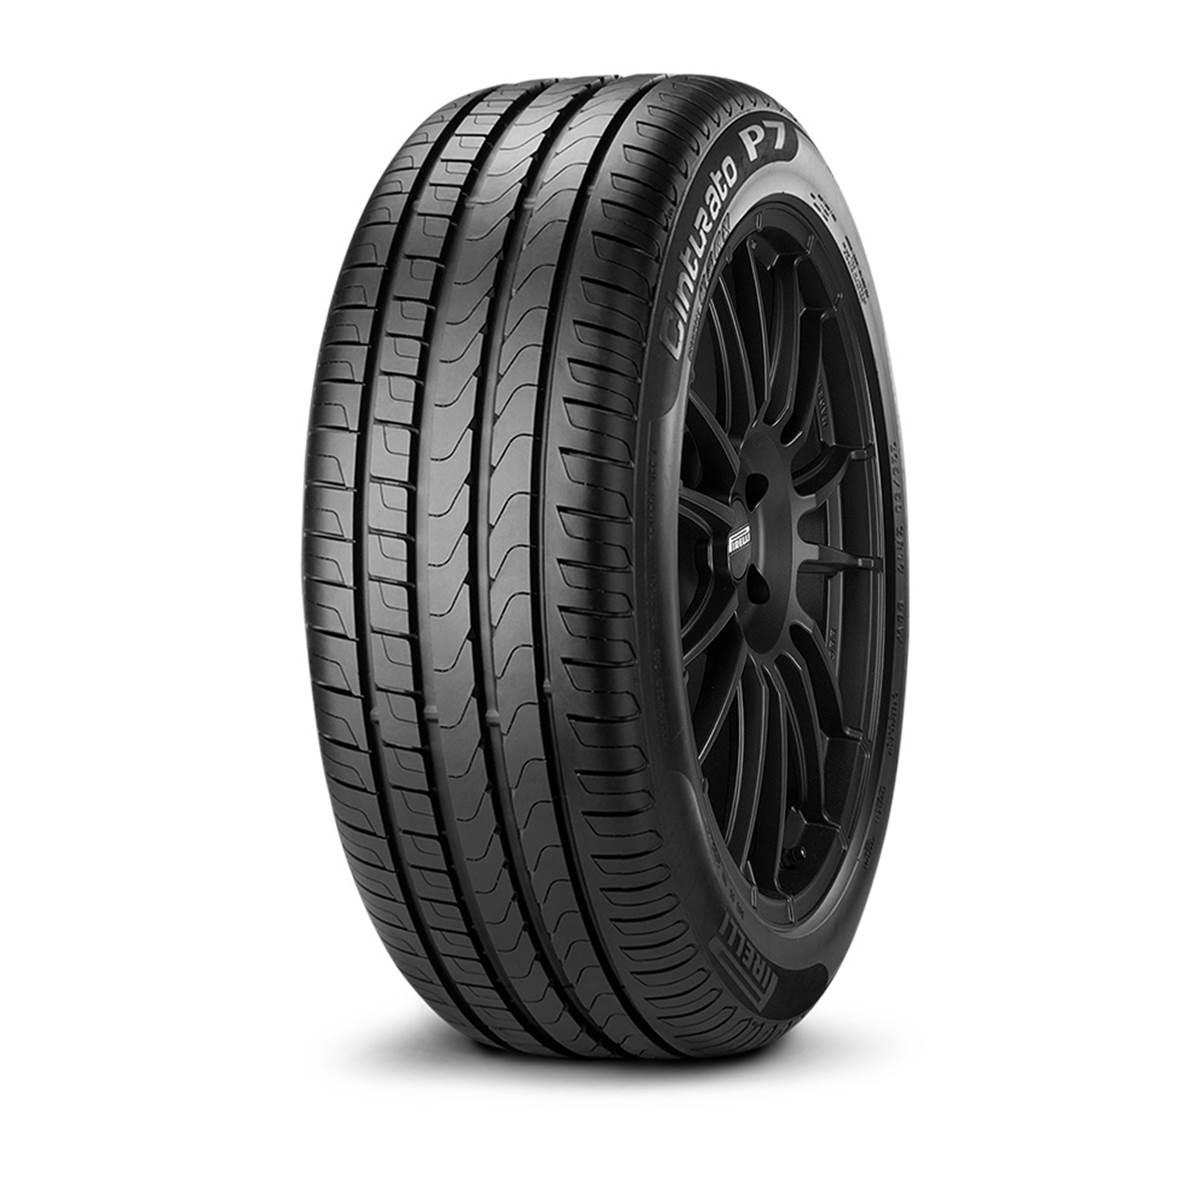 Pneu Pirelli 215/55R17 94W Cinturato P7